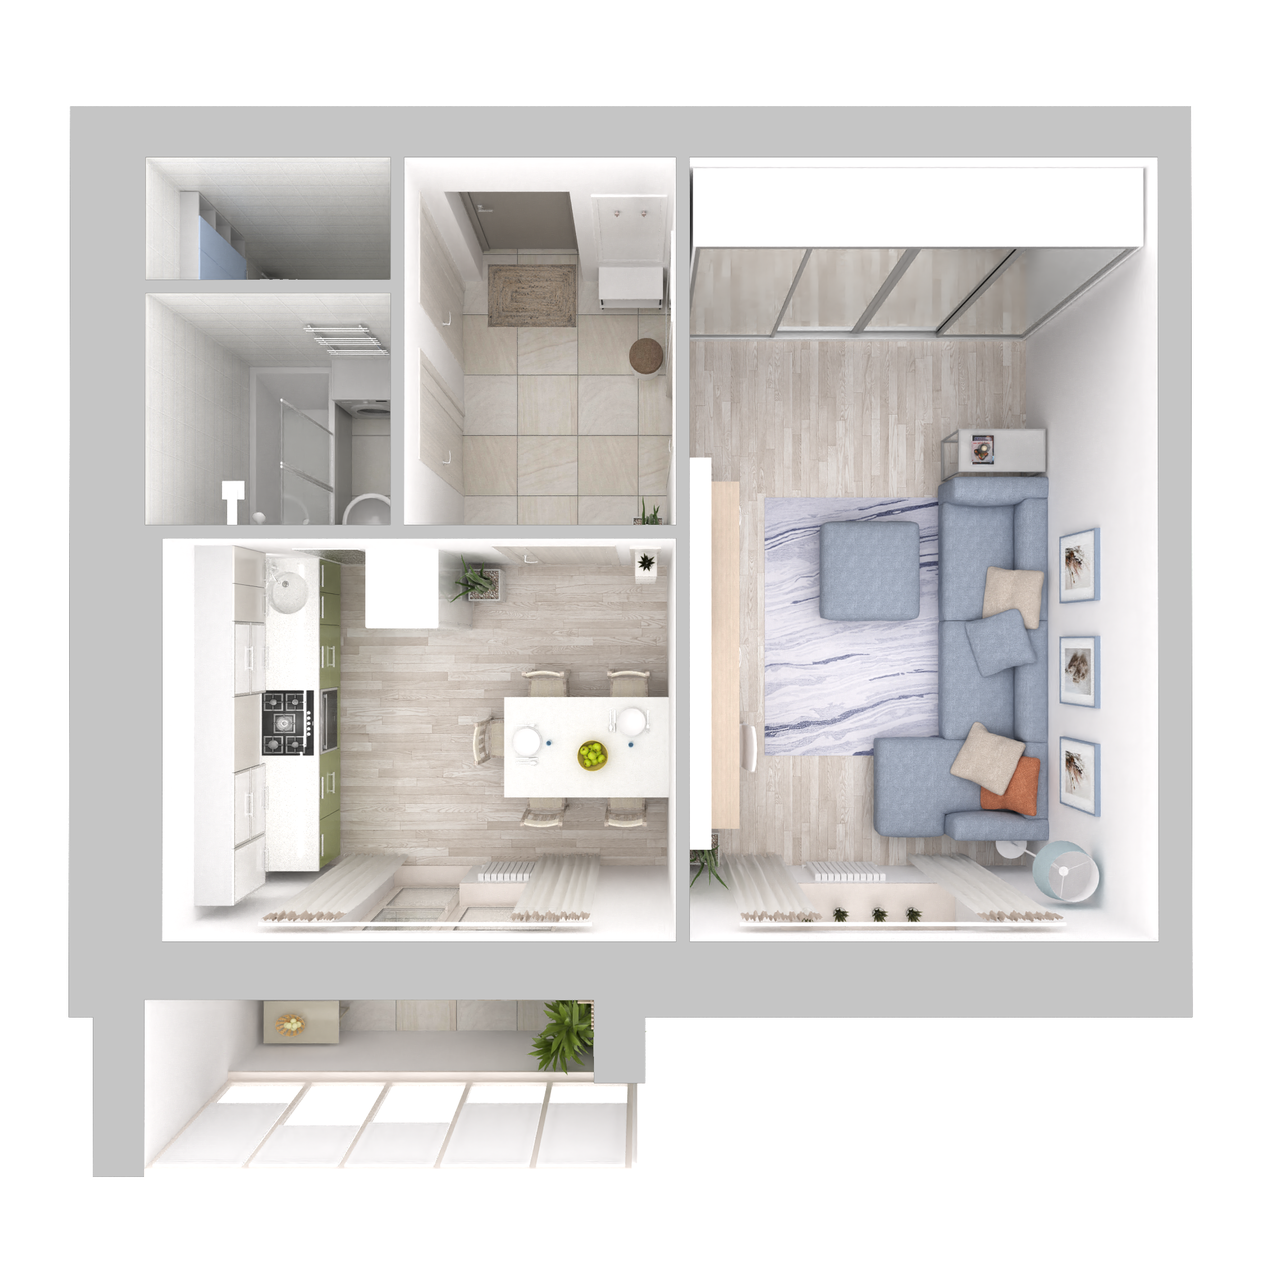 Дом 6 - 1-комнатная №156